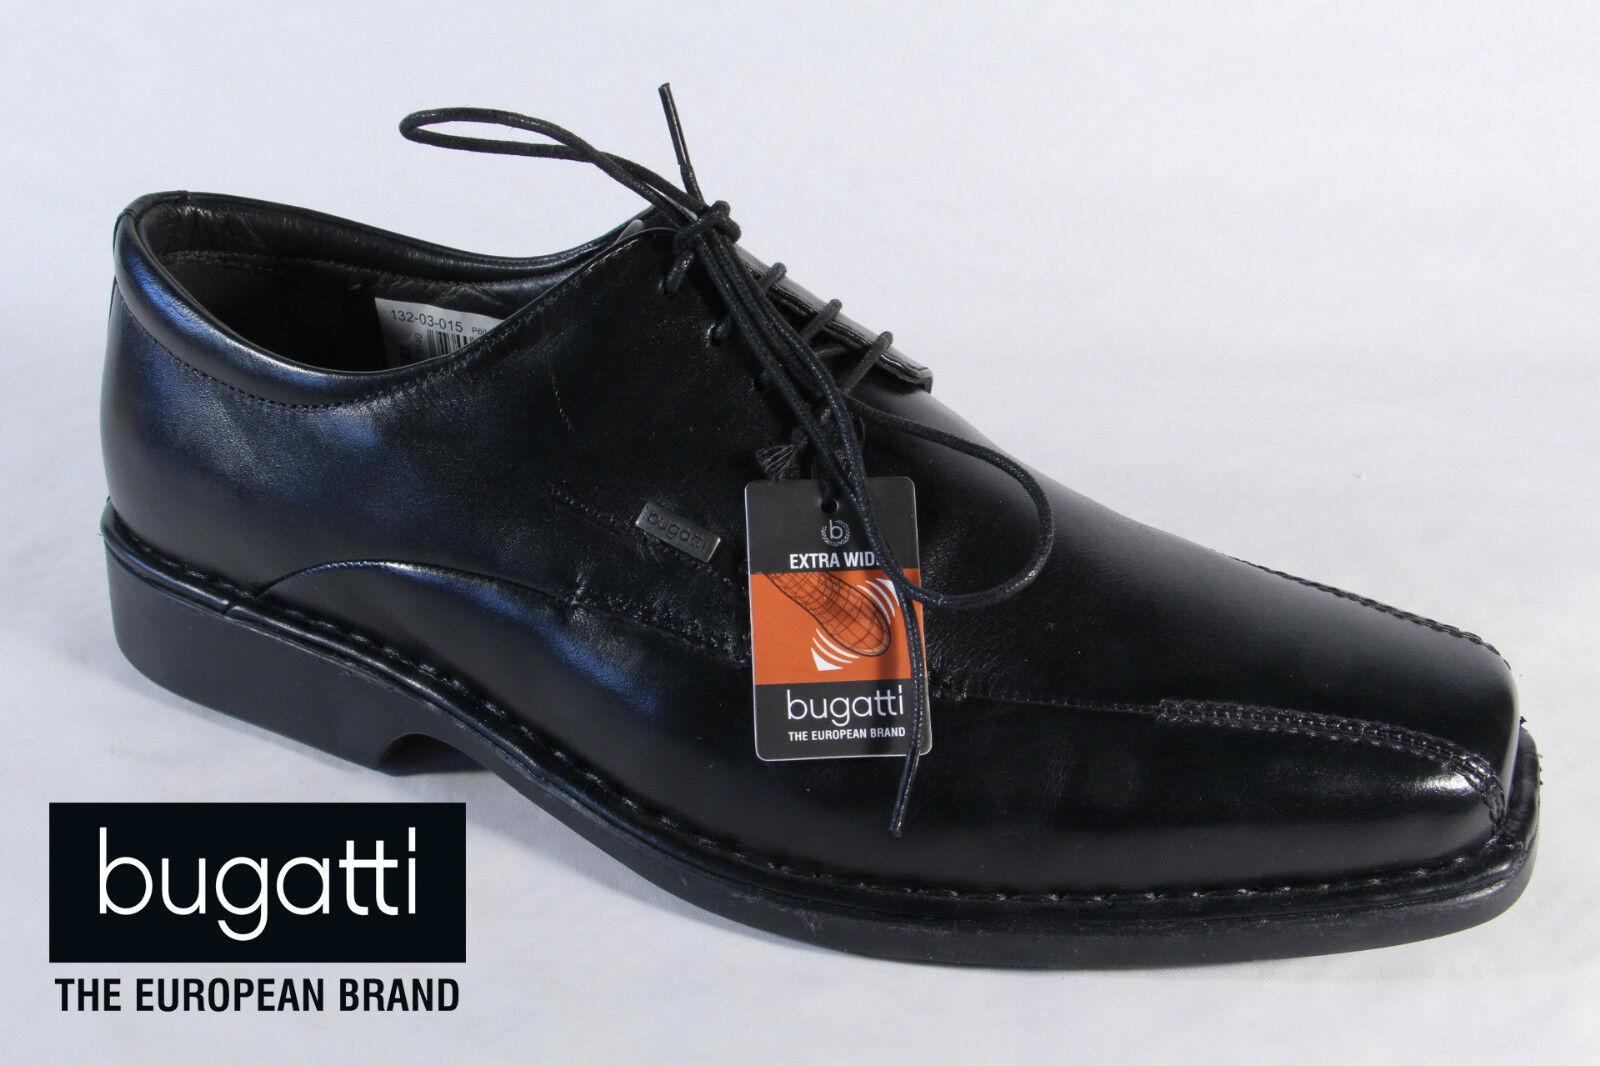 Bugatti Homme Chaussures à Lacets, Chaussures Basses paniers Noir Cuir Neuf